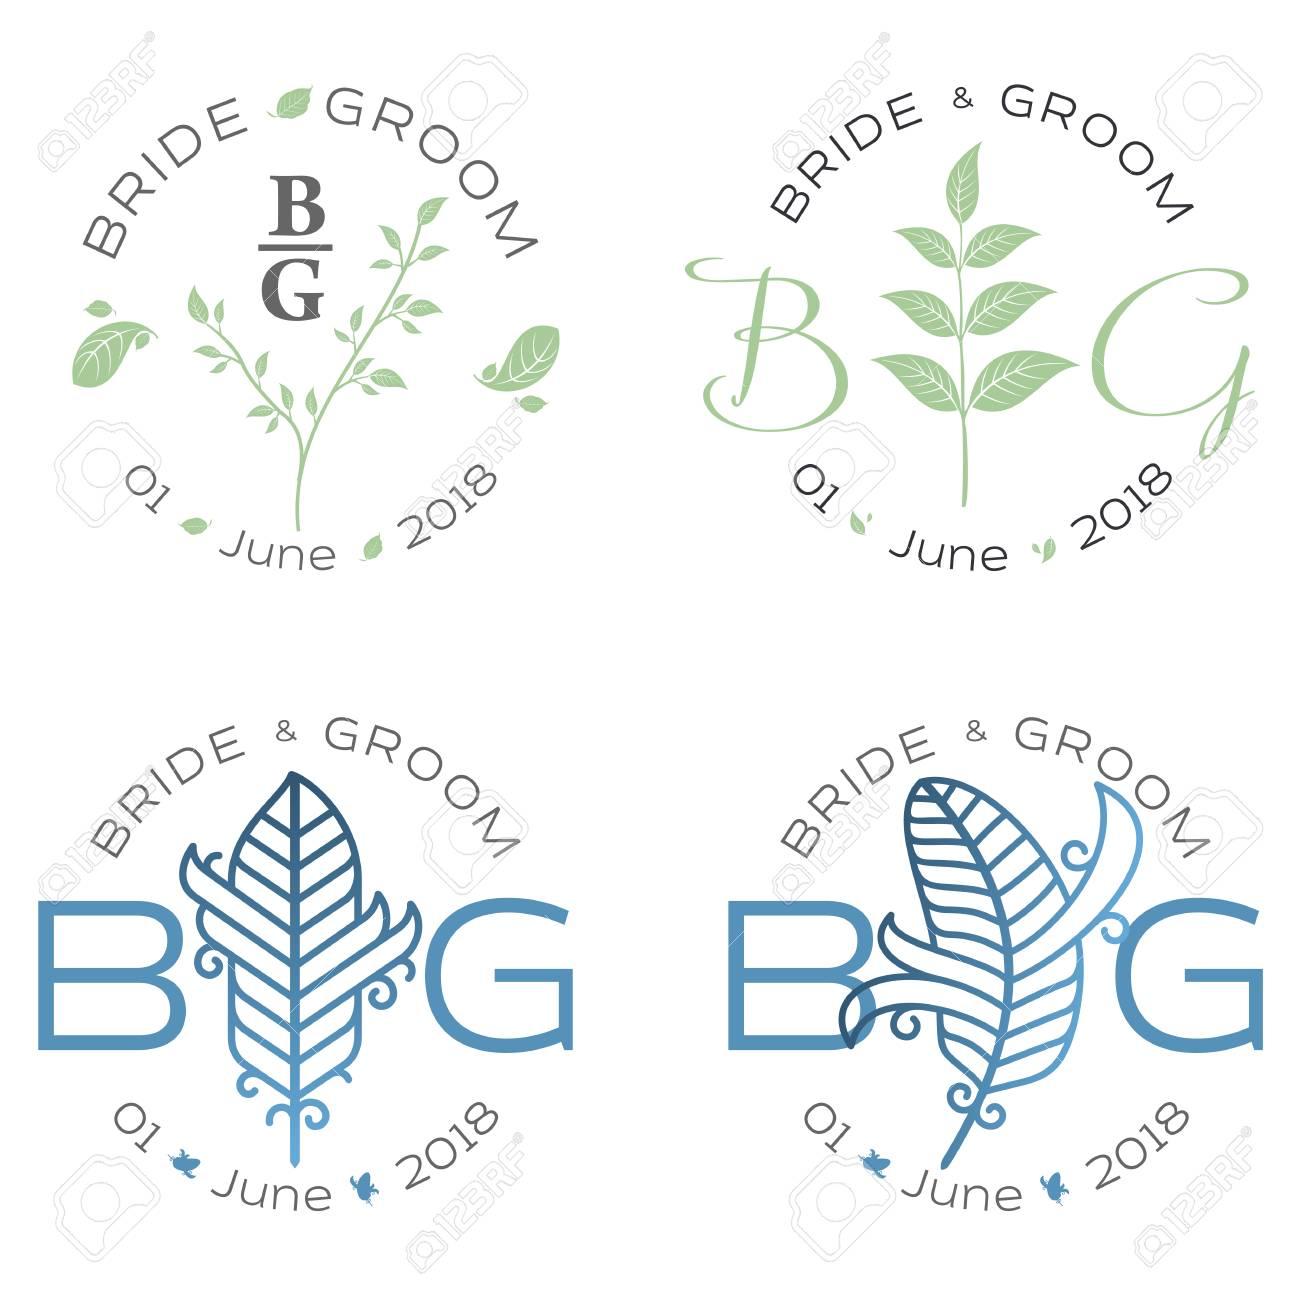 elegant design templates for wedding card wedding logo for business